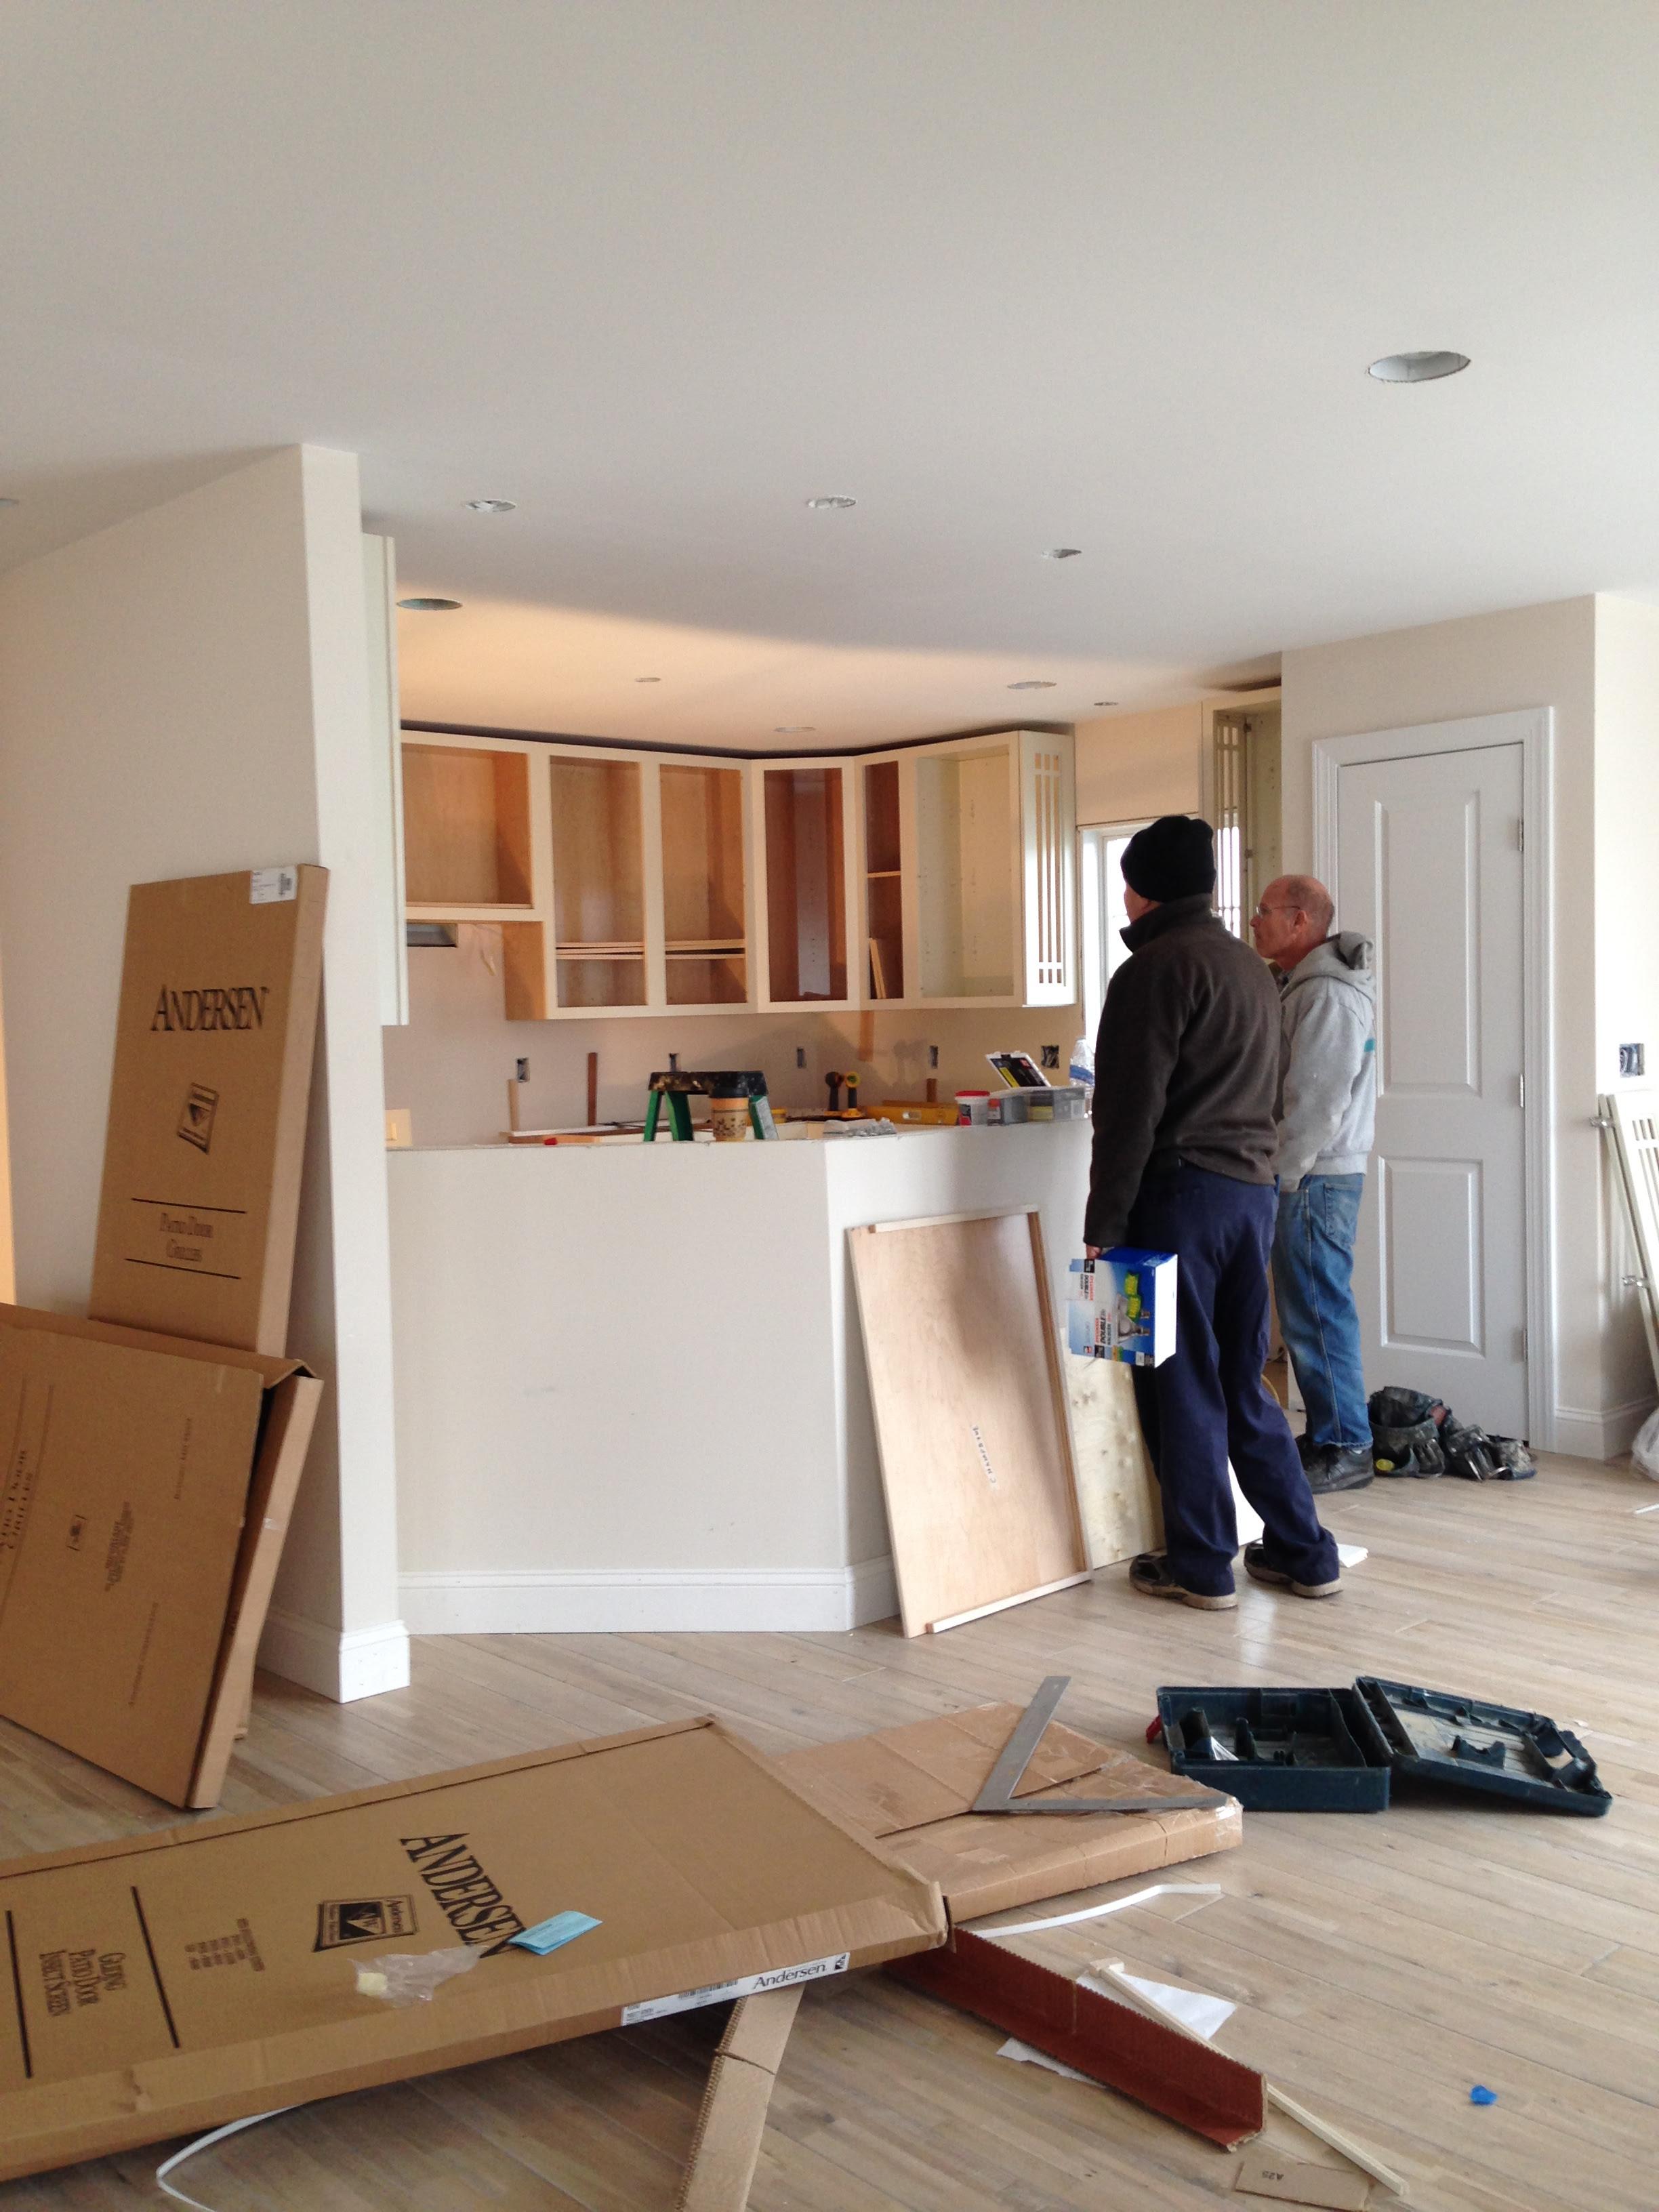 2014-01-02 View of Kitchen at 8 Sandpiper Ct Lewes, DE ...